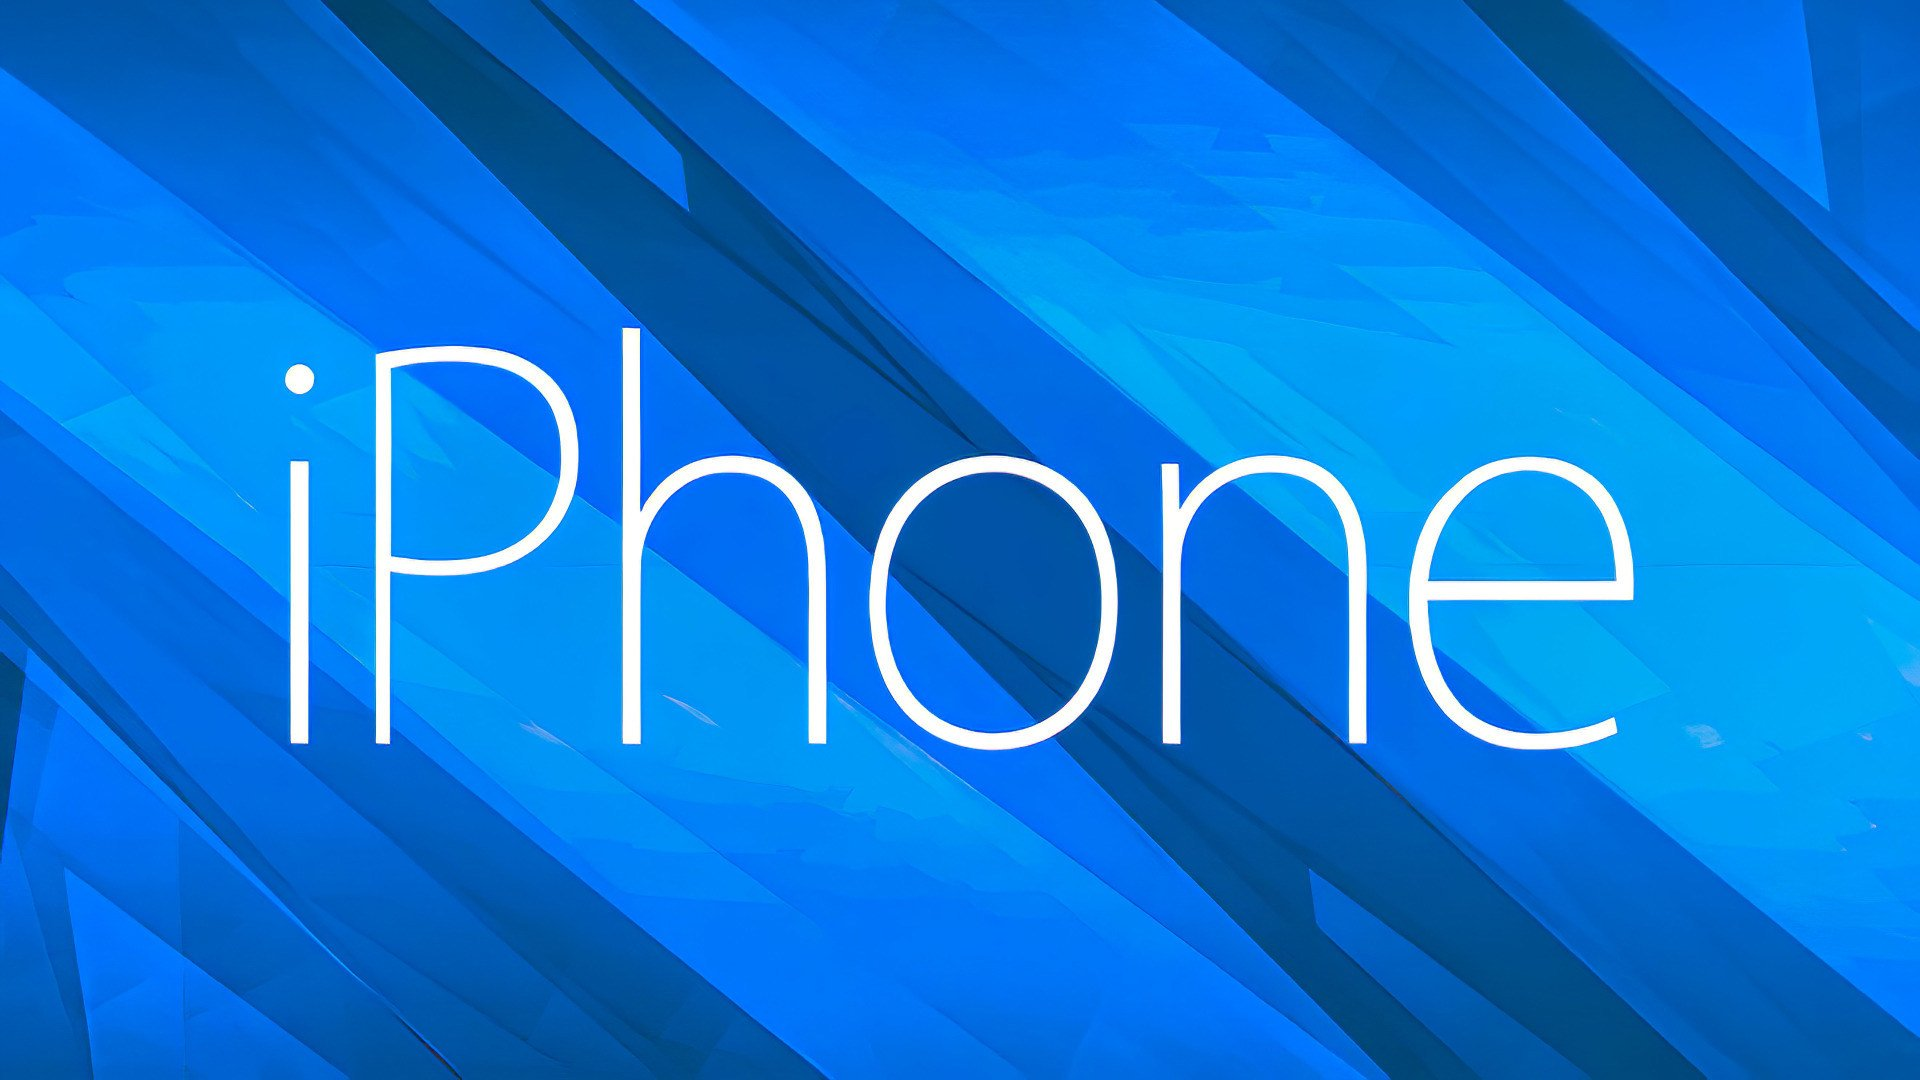 Smartphone, Apple, Iphone, Apple iPhone, iPhone X, iPhone 12, iPhone 11, Apple iPhone X, iPhone XS, 739700, iPhone Xs Max, Apple iPhone XS, Apple iPhone Xs Max